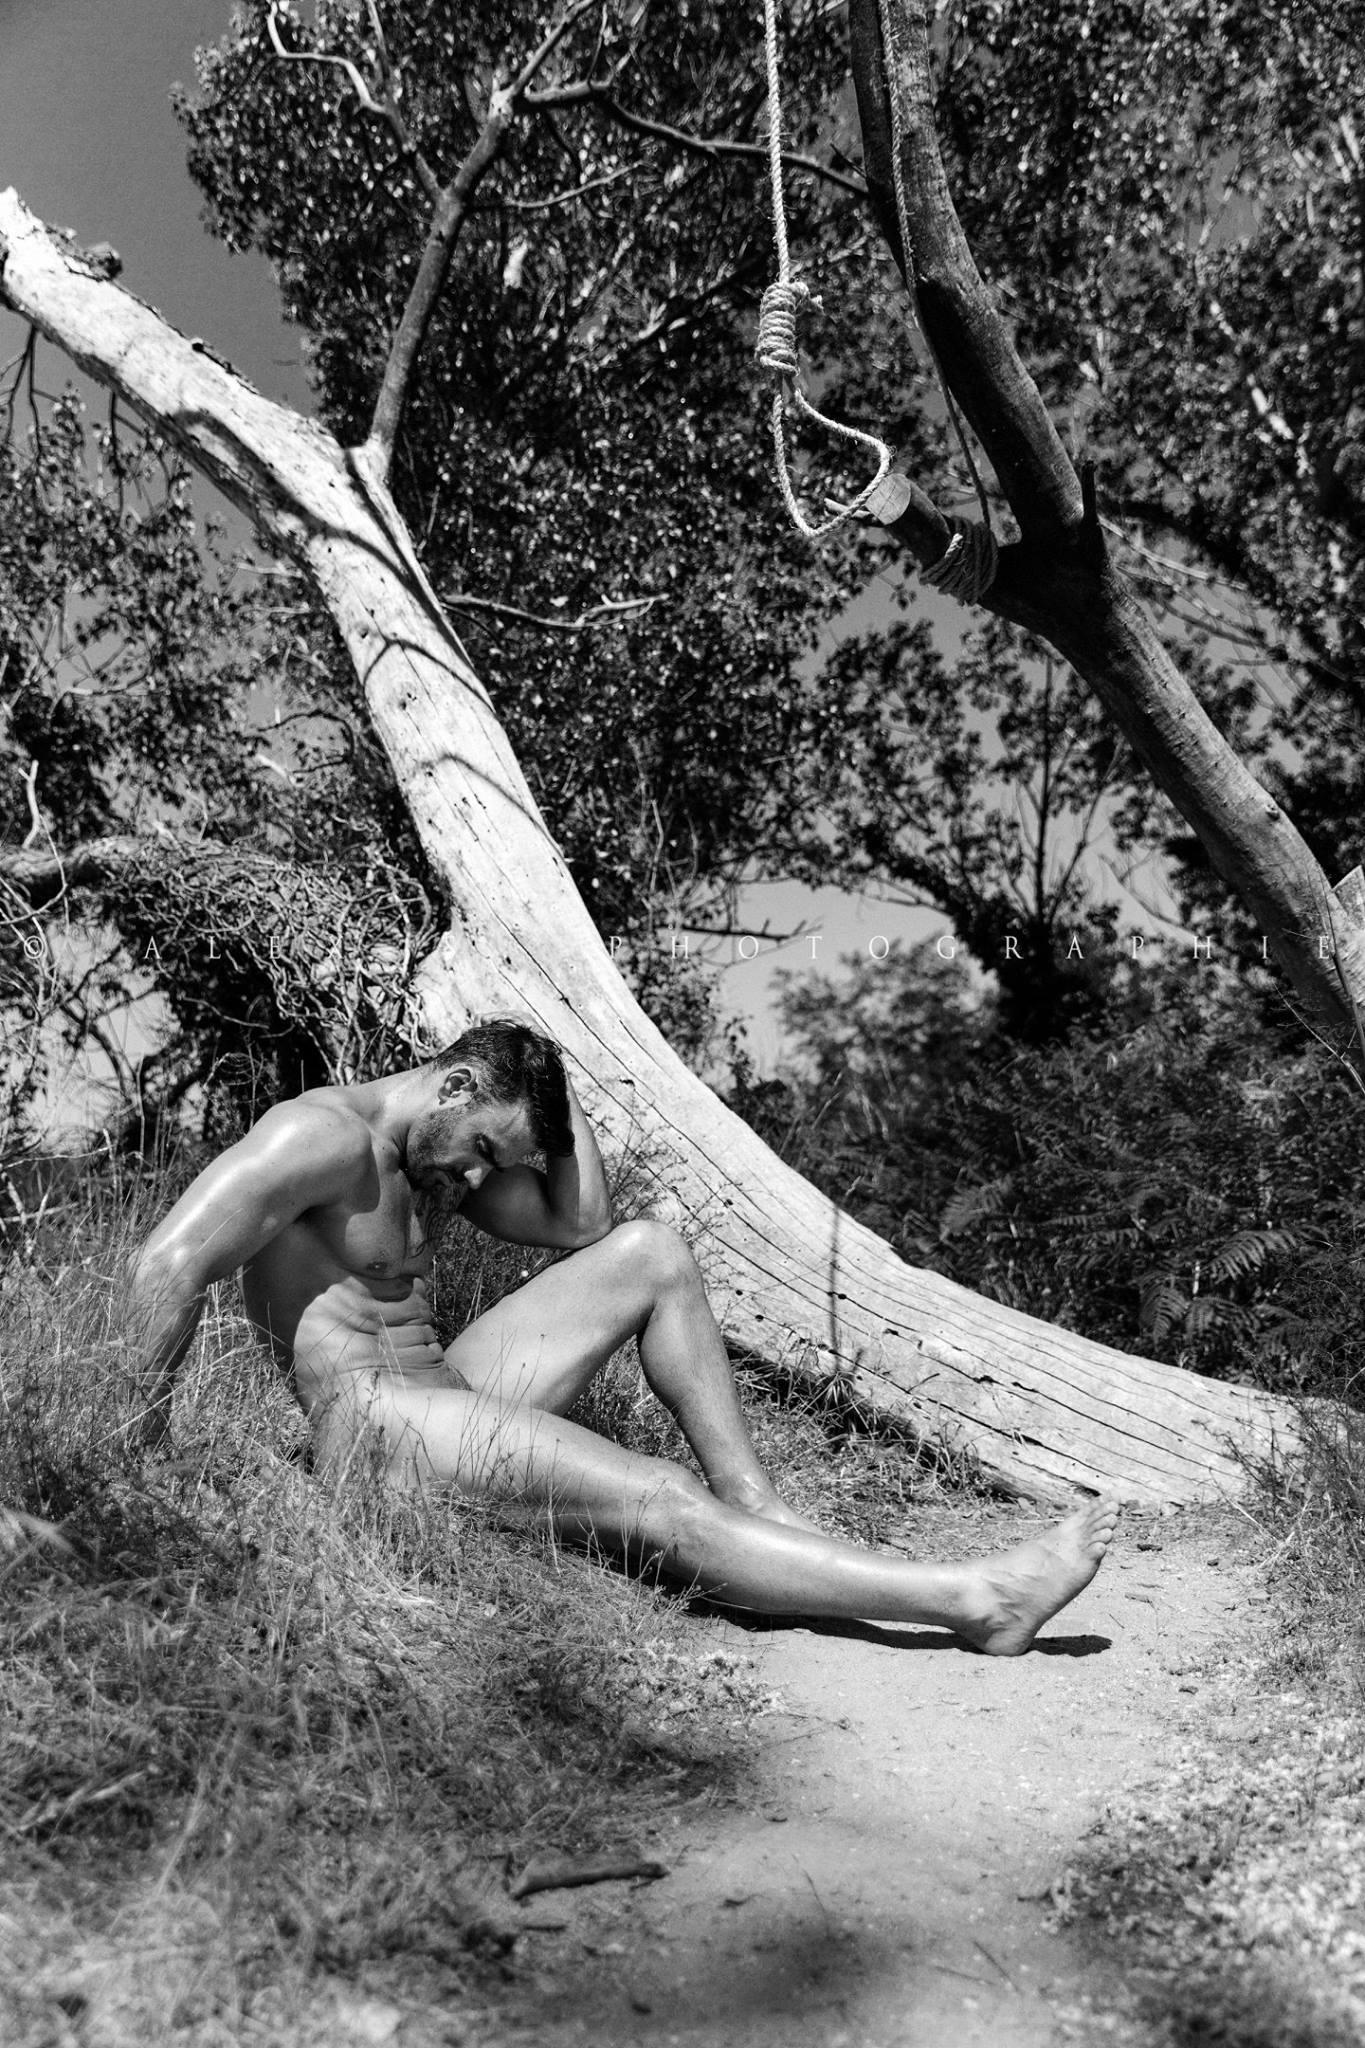 Jess Vill by Alexis Salgues